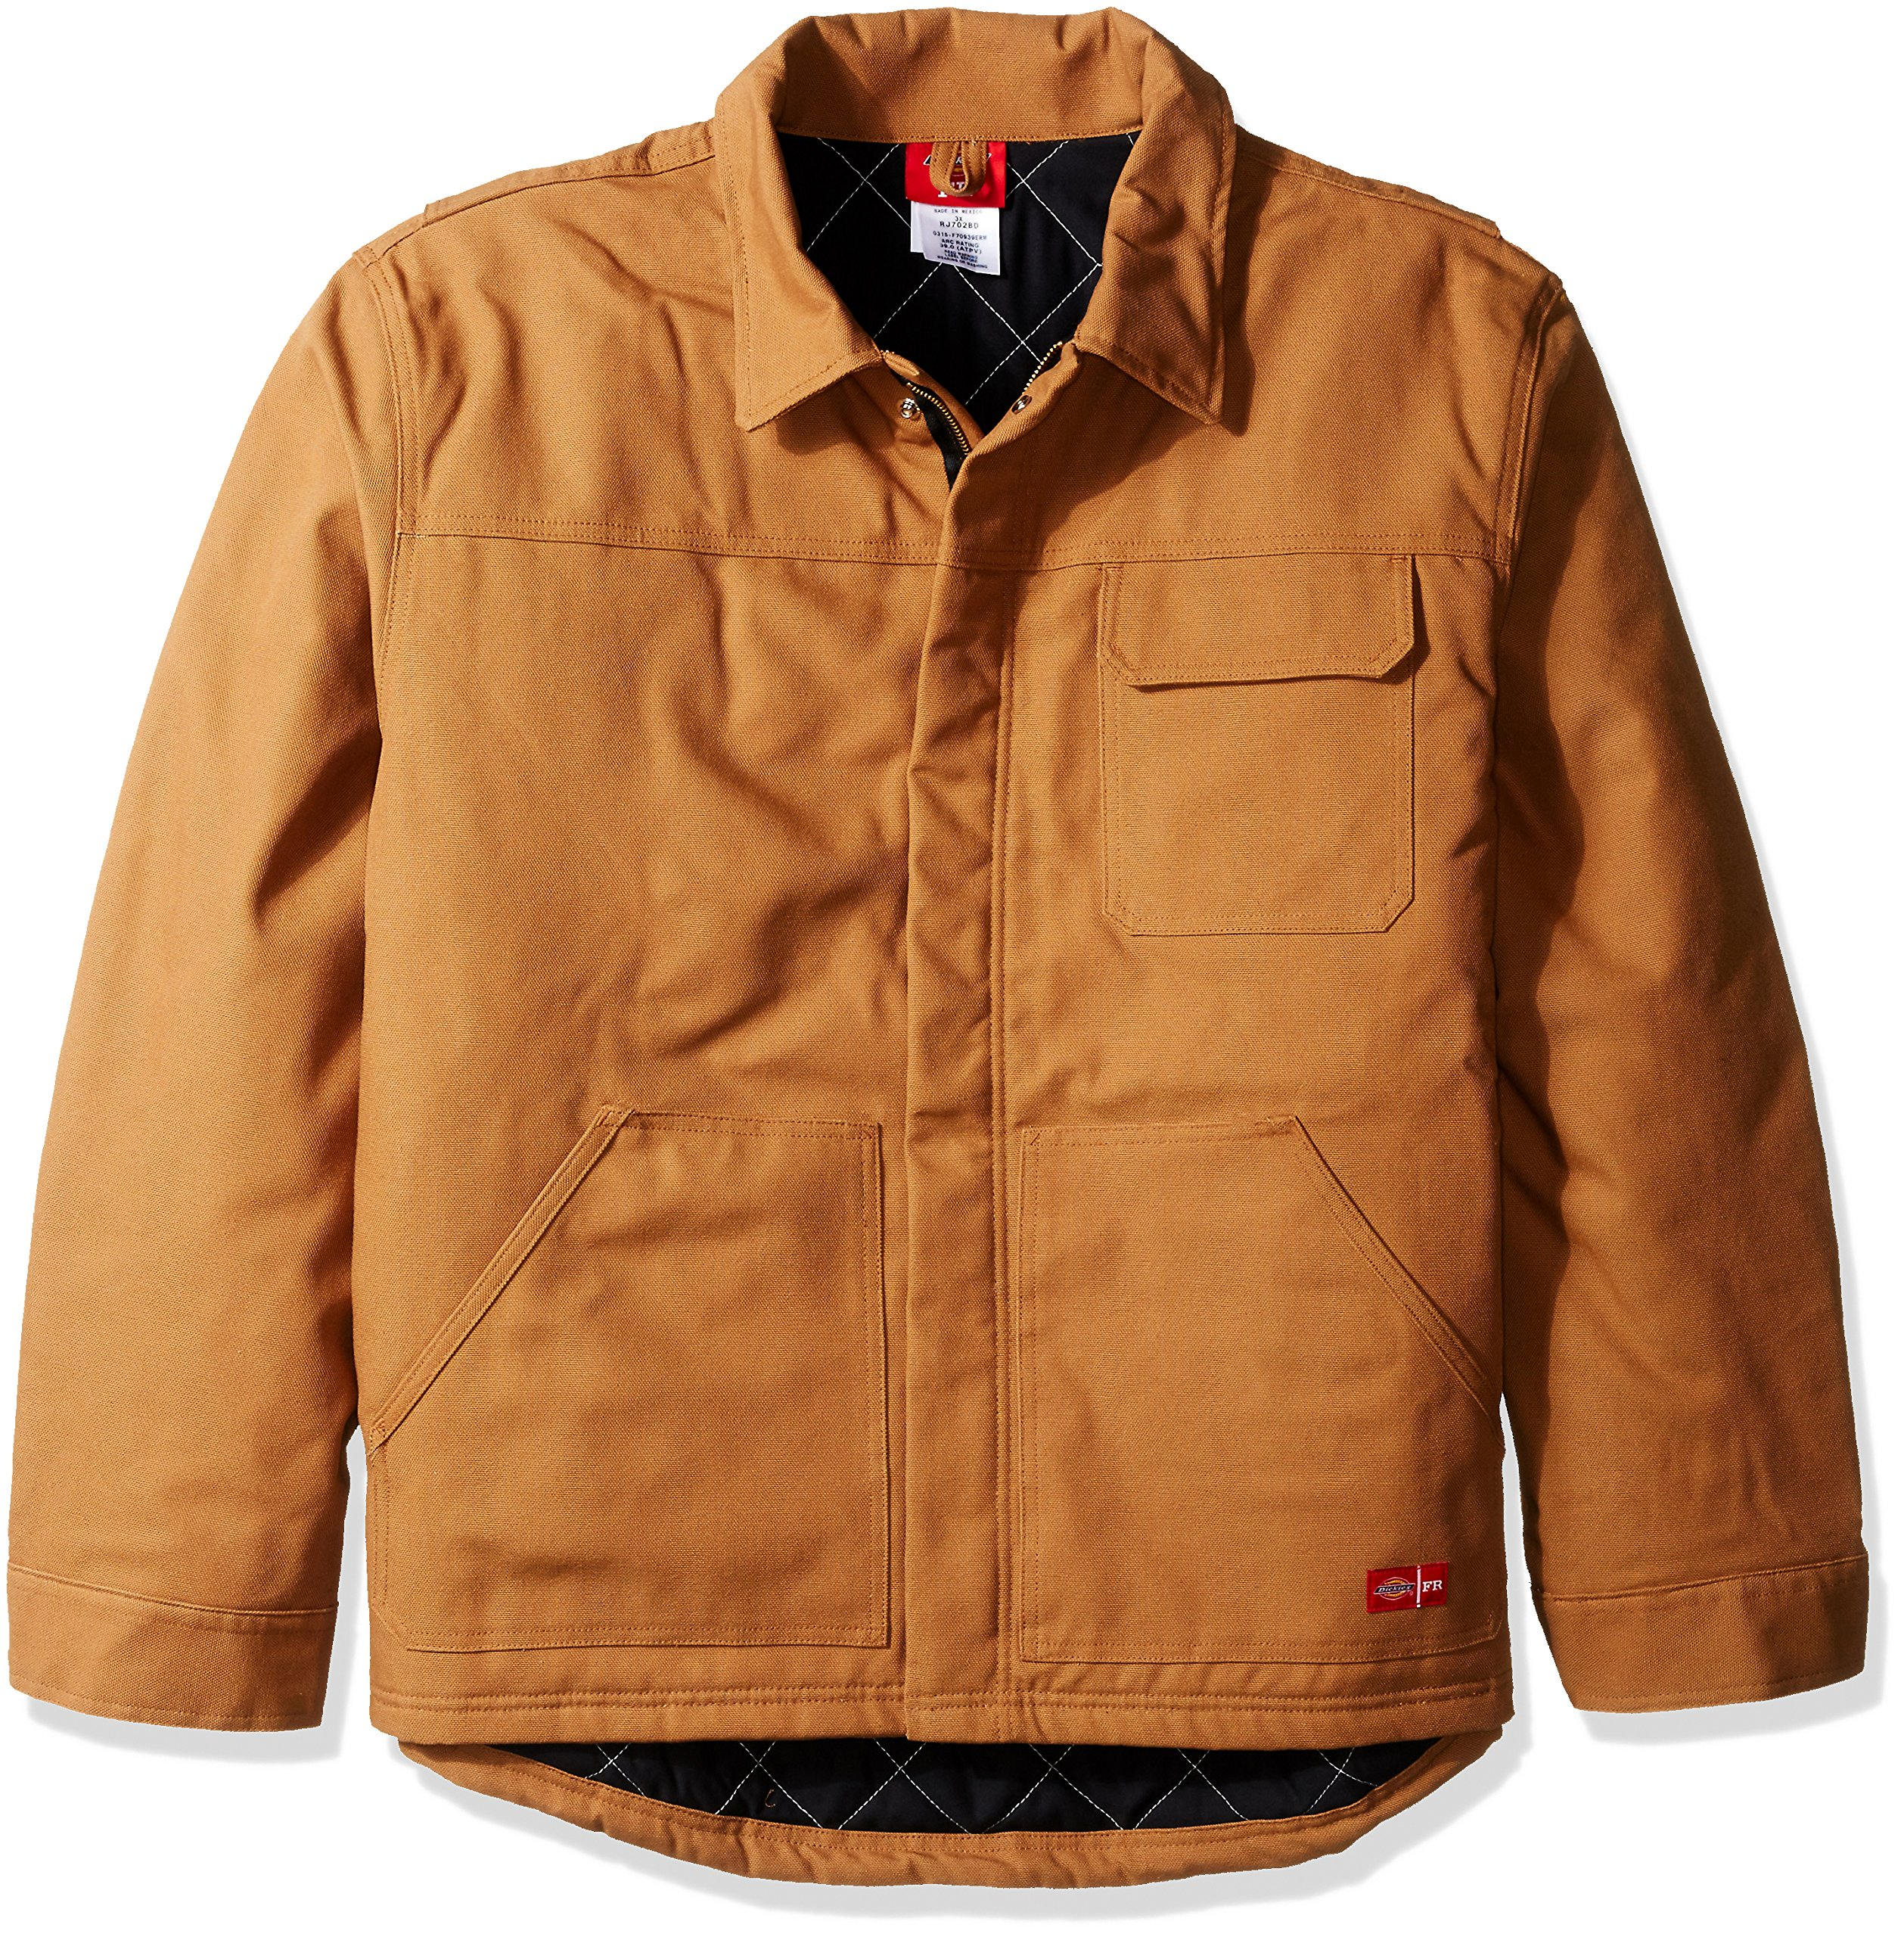 Dickies Men's Flame-Resistant Insulated Jacket Big, Brown Duck, 3X by Dickies